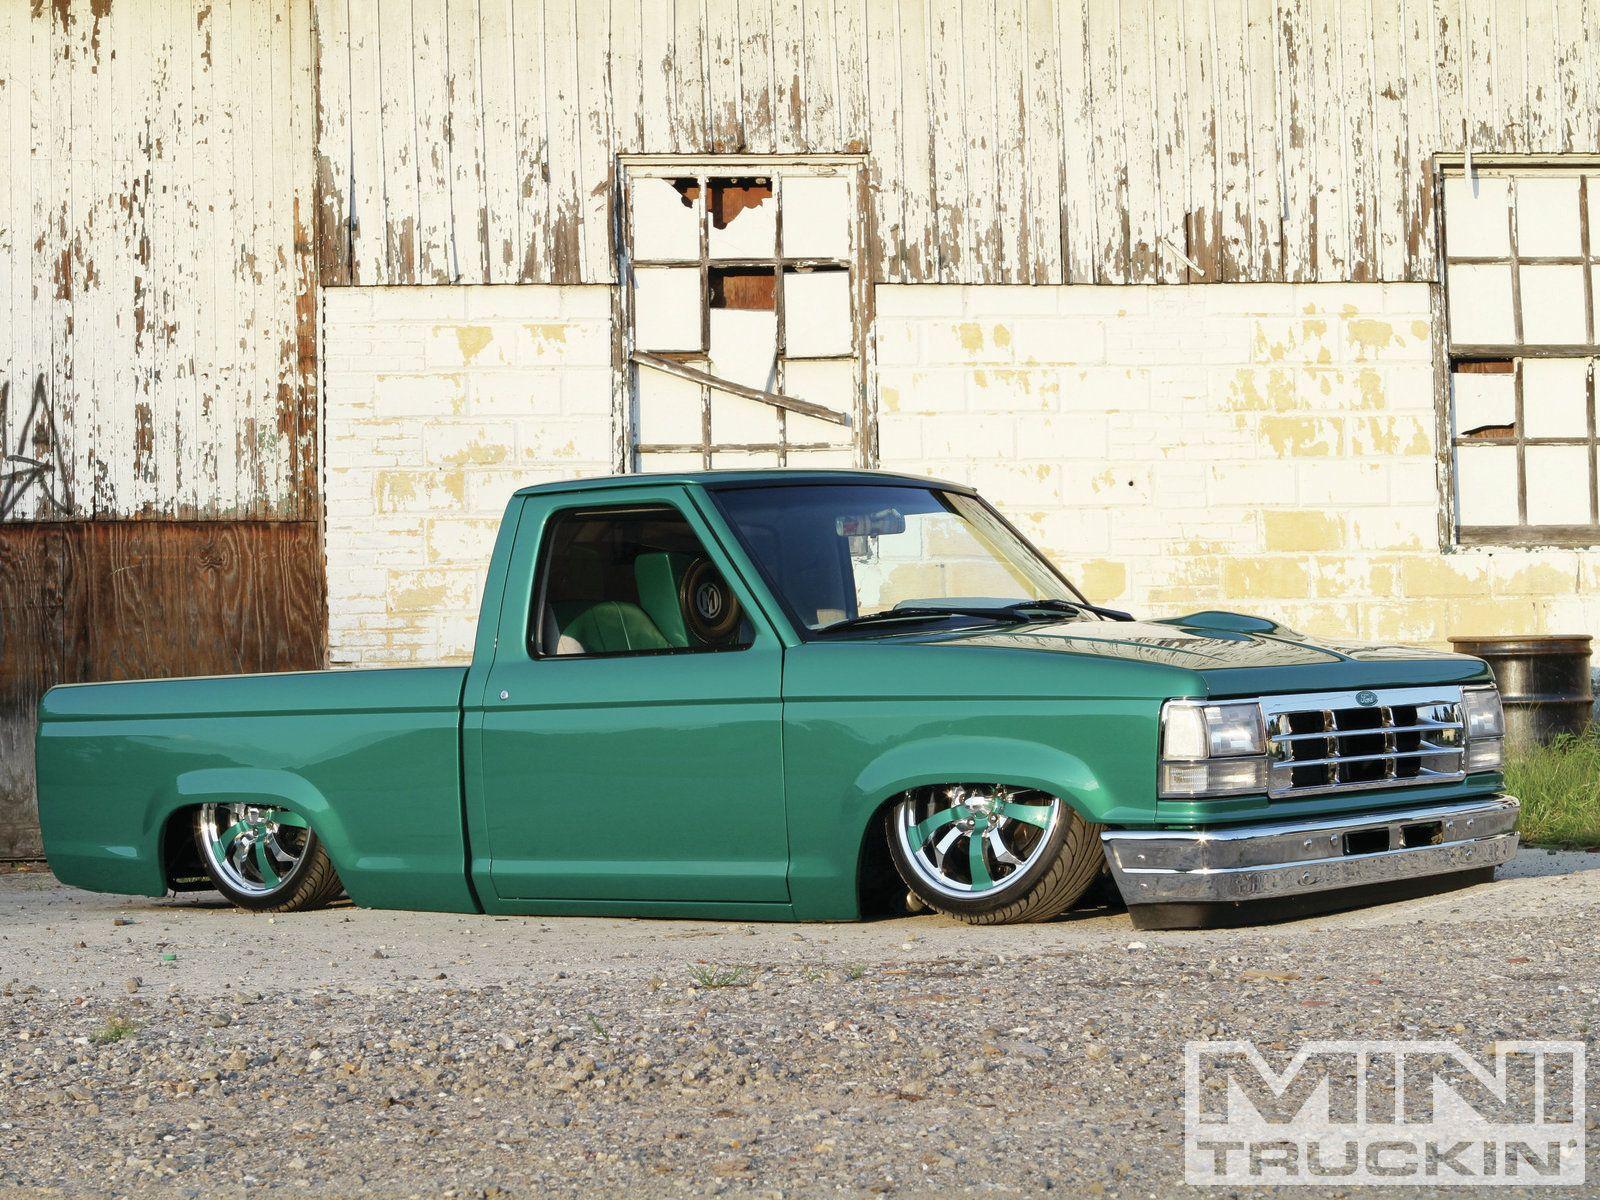 91 dodge truck galleryhip com the hippest galleries - Lowered Green 1992 Ford Ranger